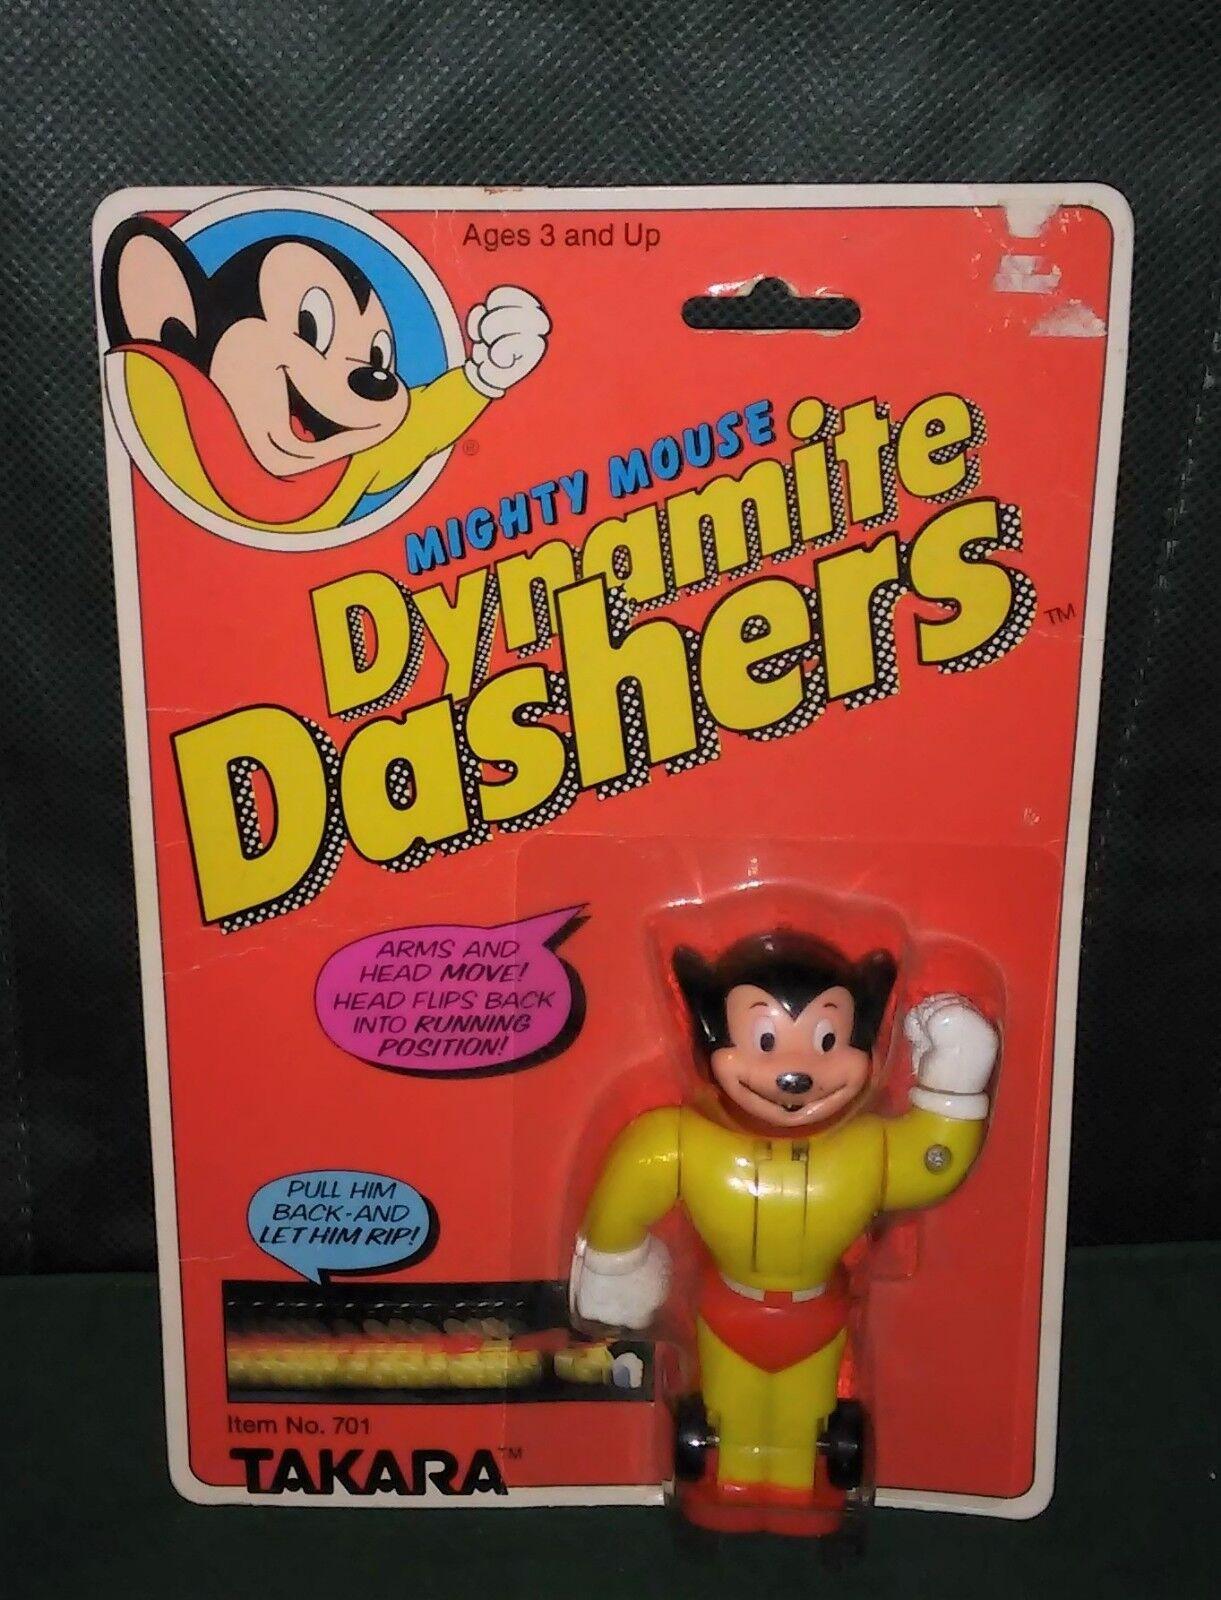 Mighty Mouse Dynamite Dashers Takara leksaksmynta på myntbubbla 1981